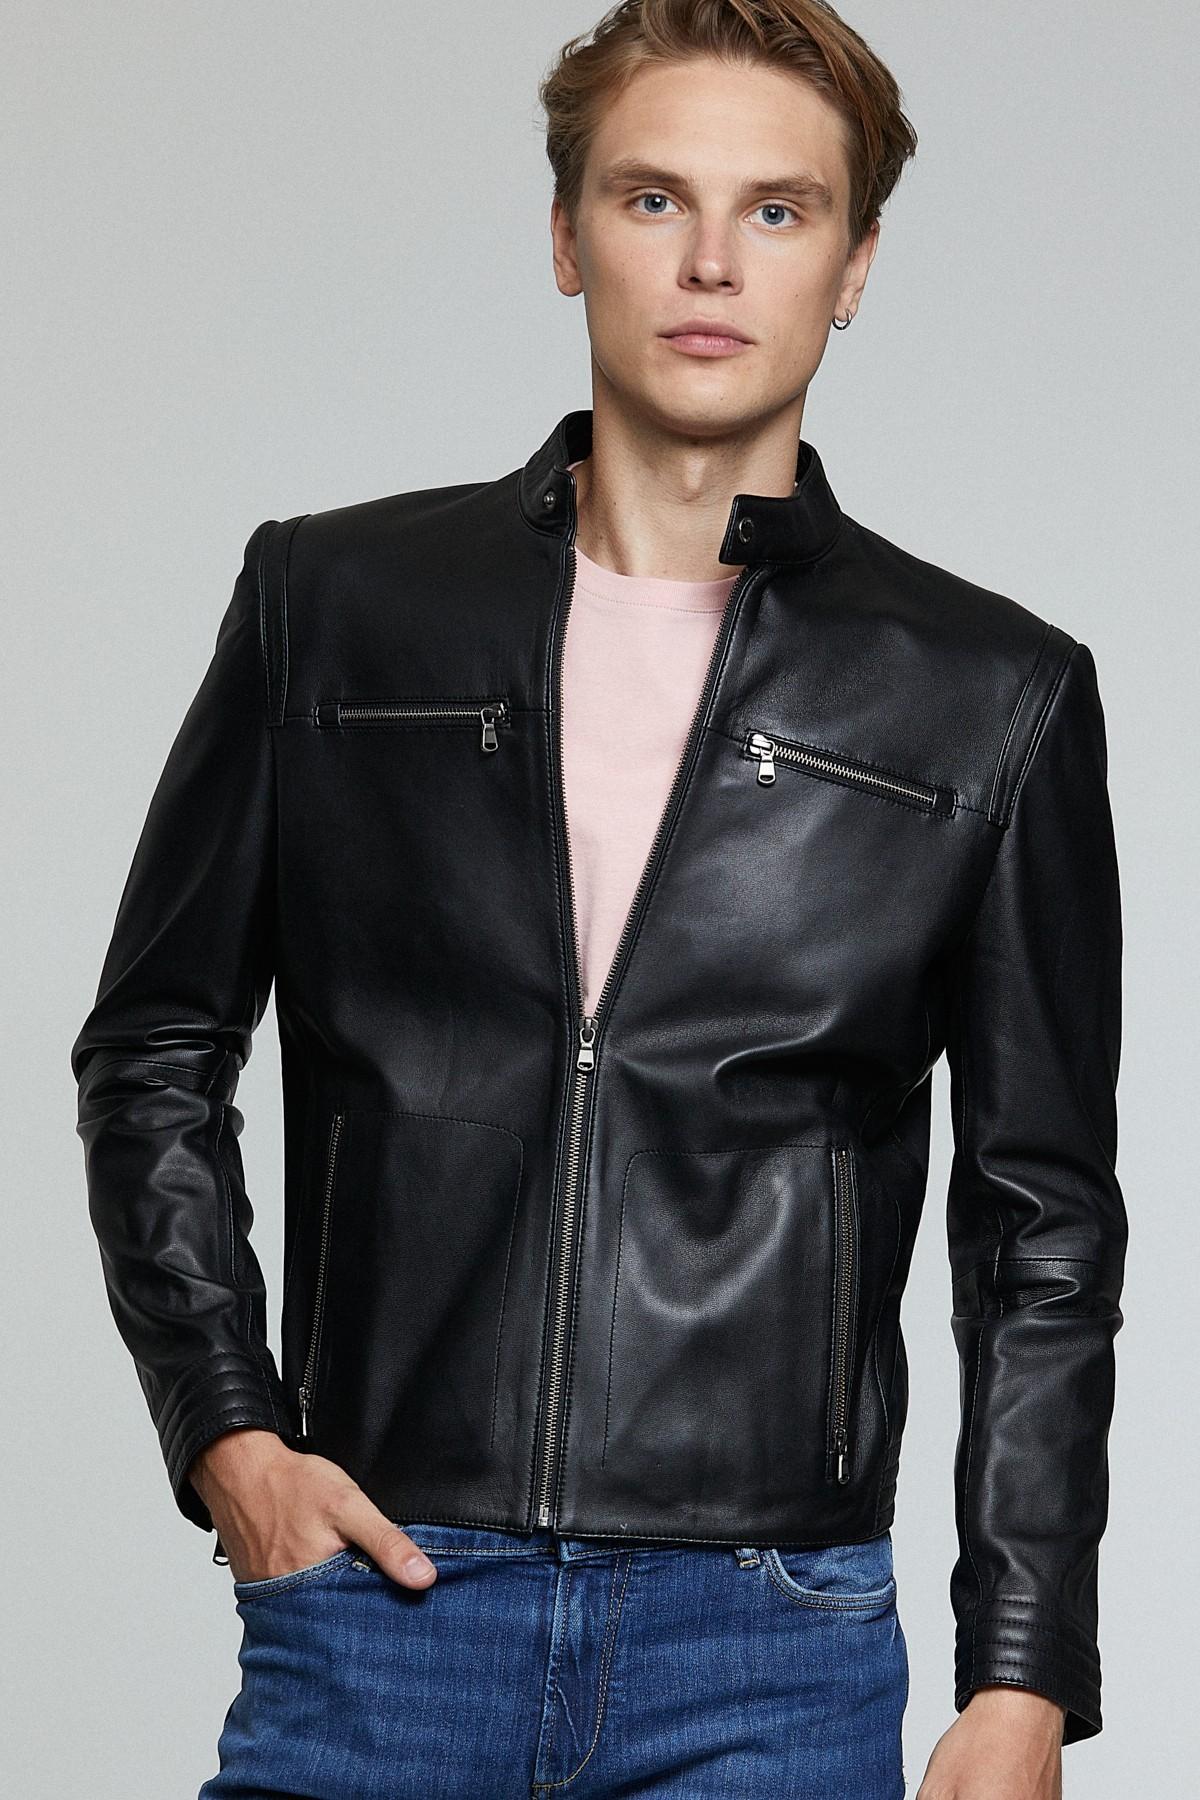 Leather Jackets Near Me